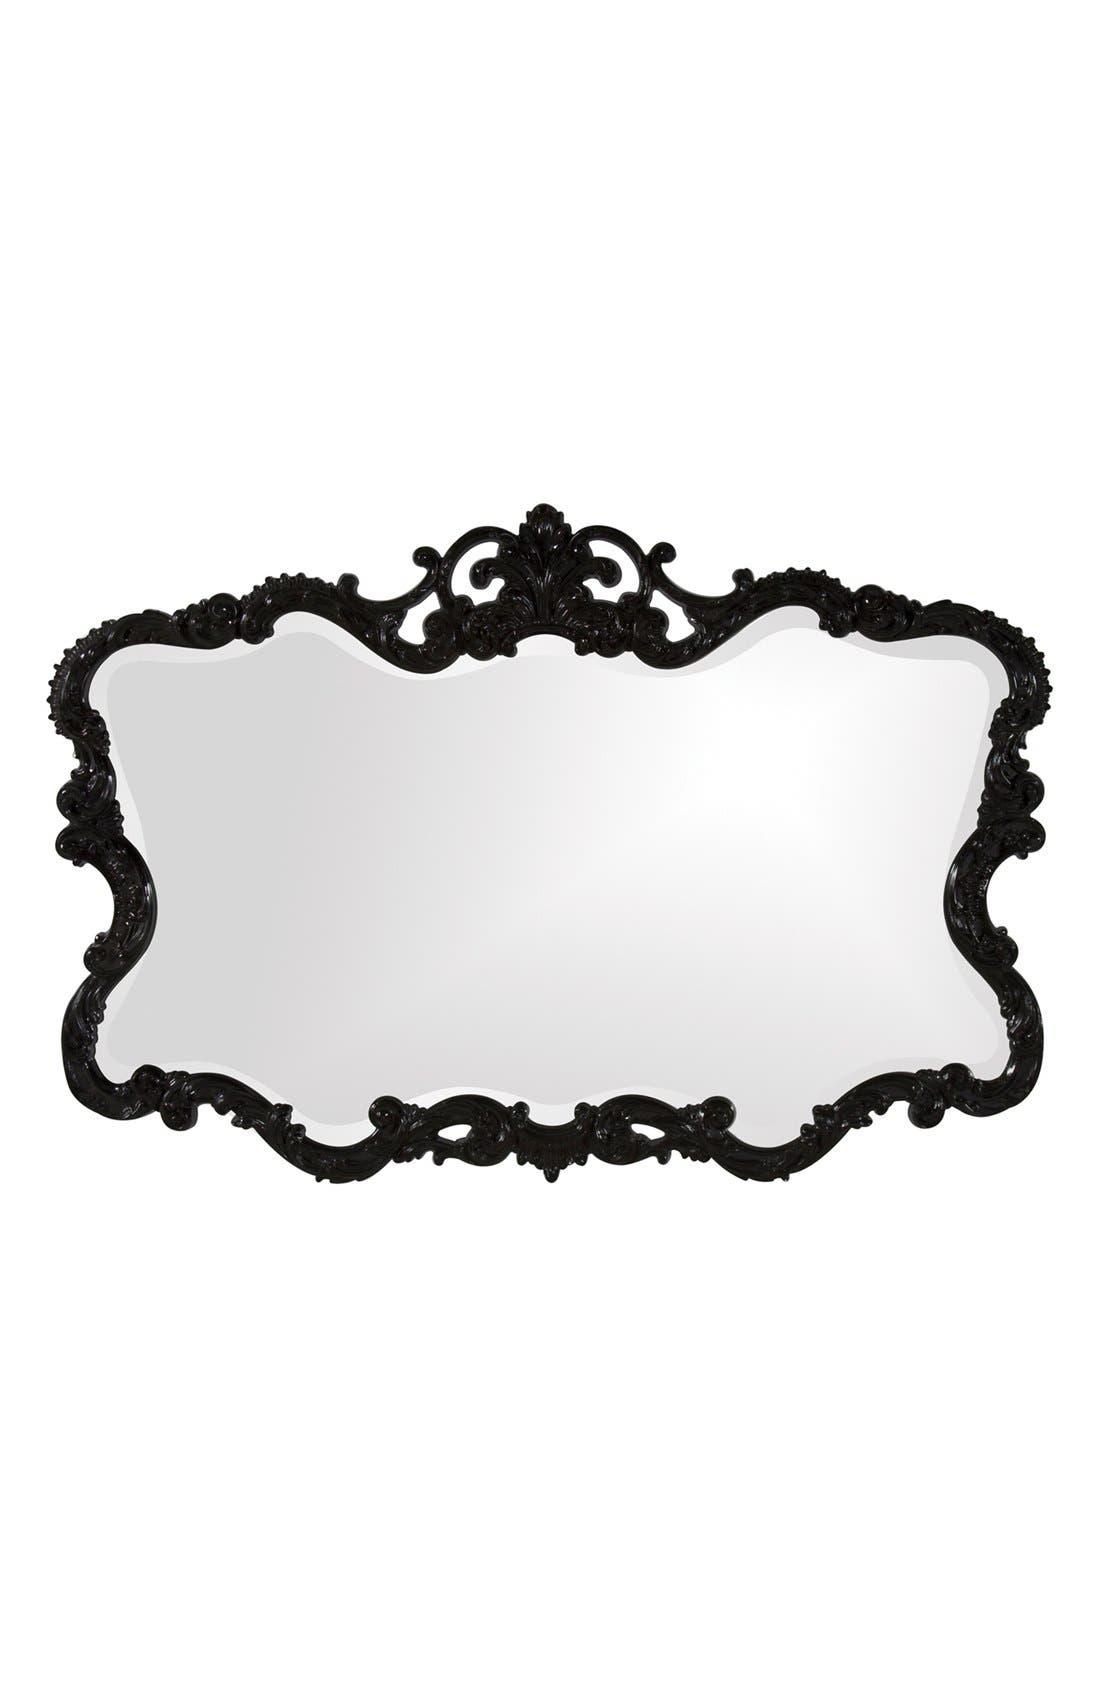 Main Image - Howard Elliott Collection 'Talida' Glossy Frame Mirror